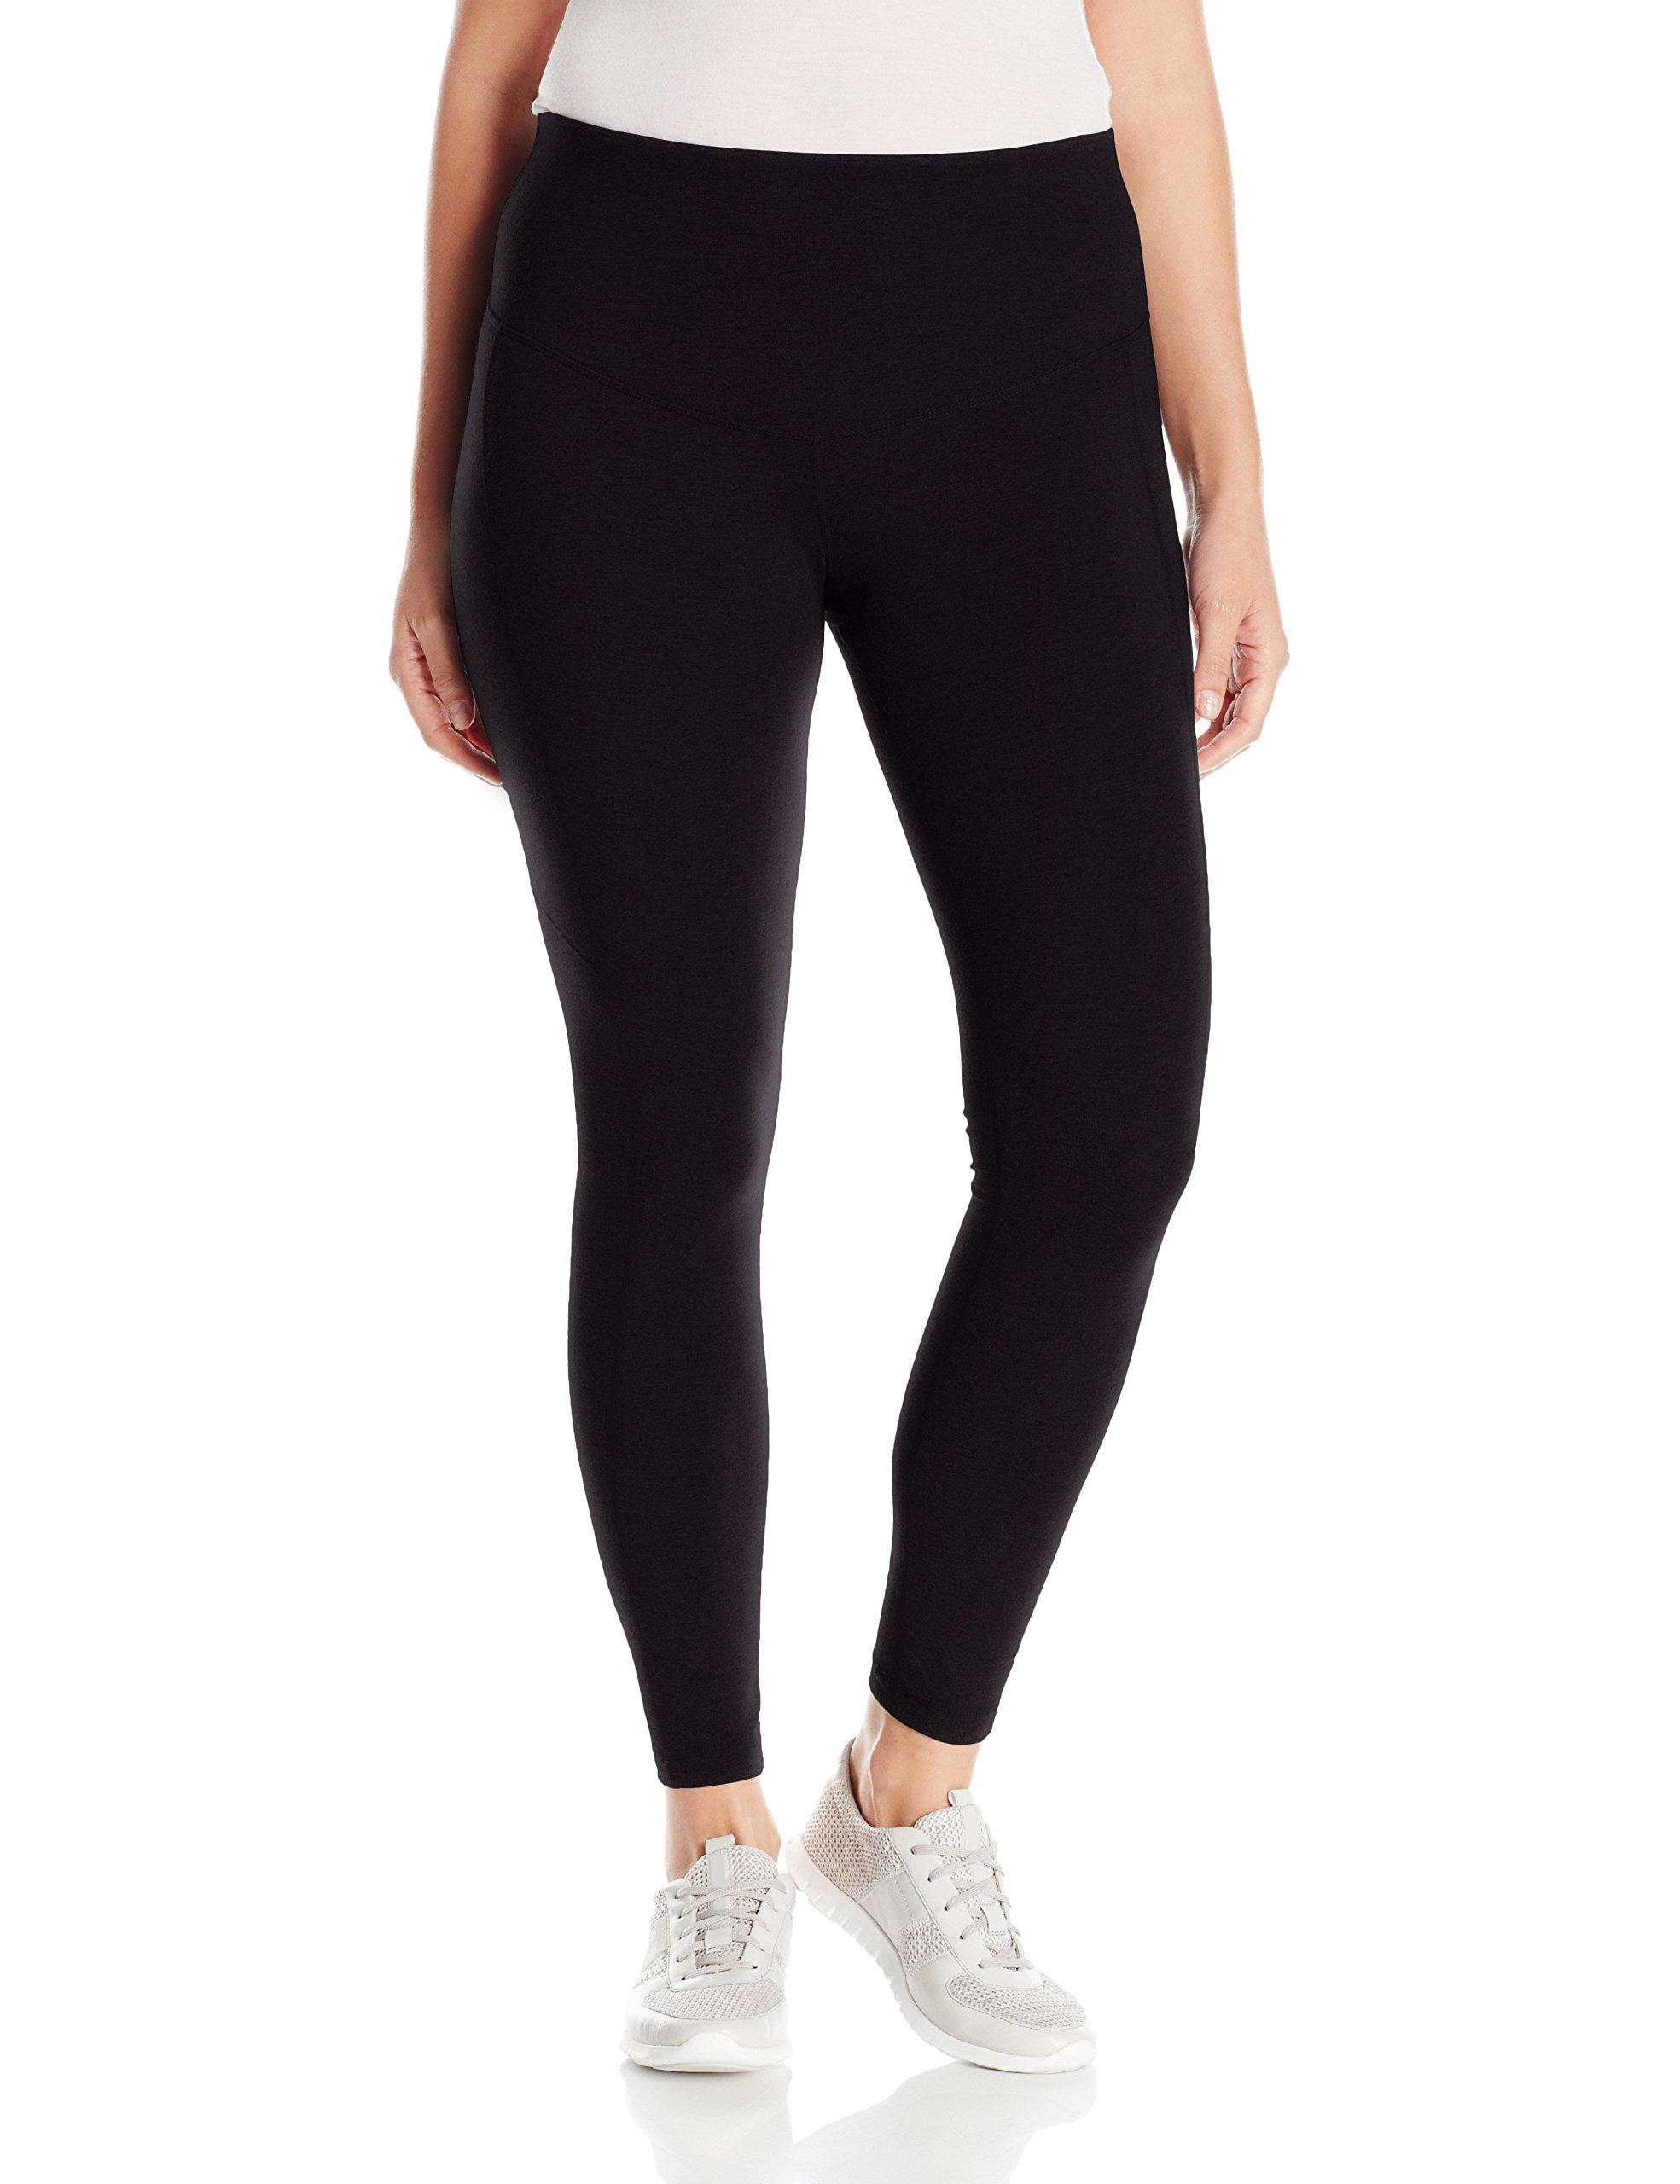 Rainbeau Curves Women's Plus Size Basix Compression Legging, Black, 2X(18/20)